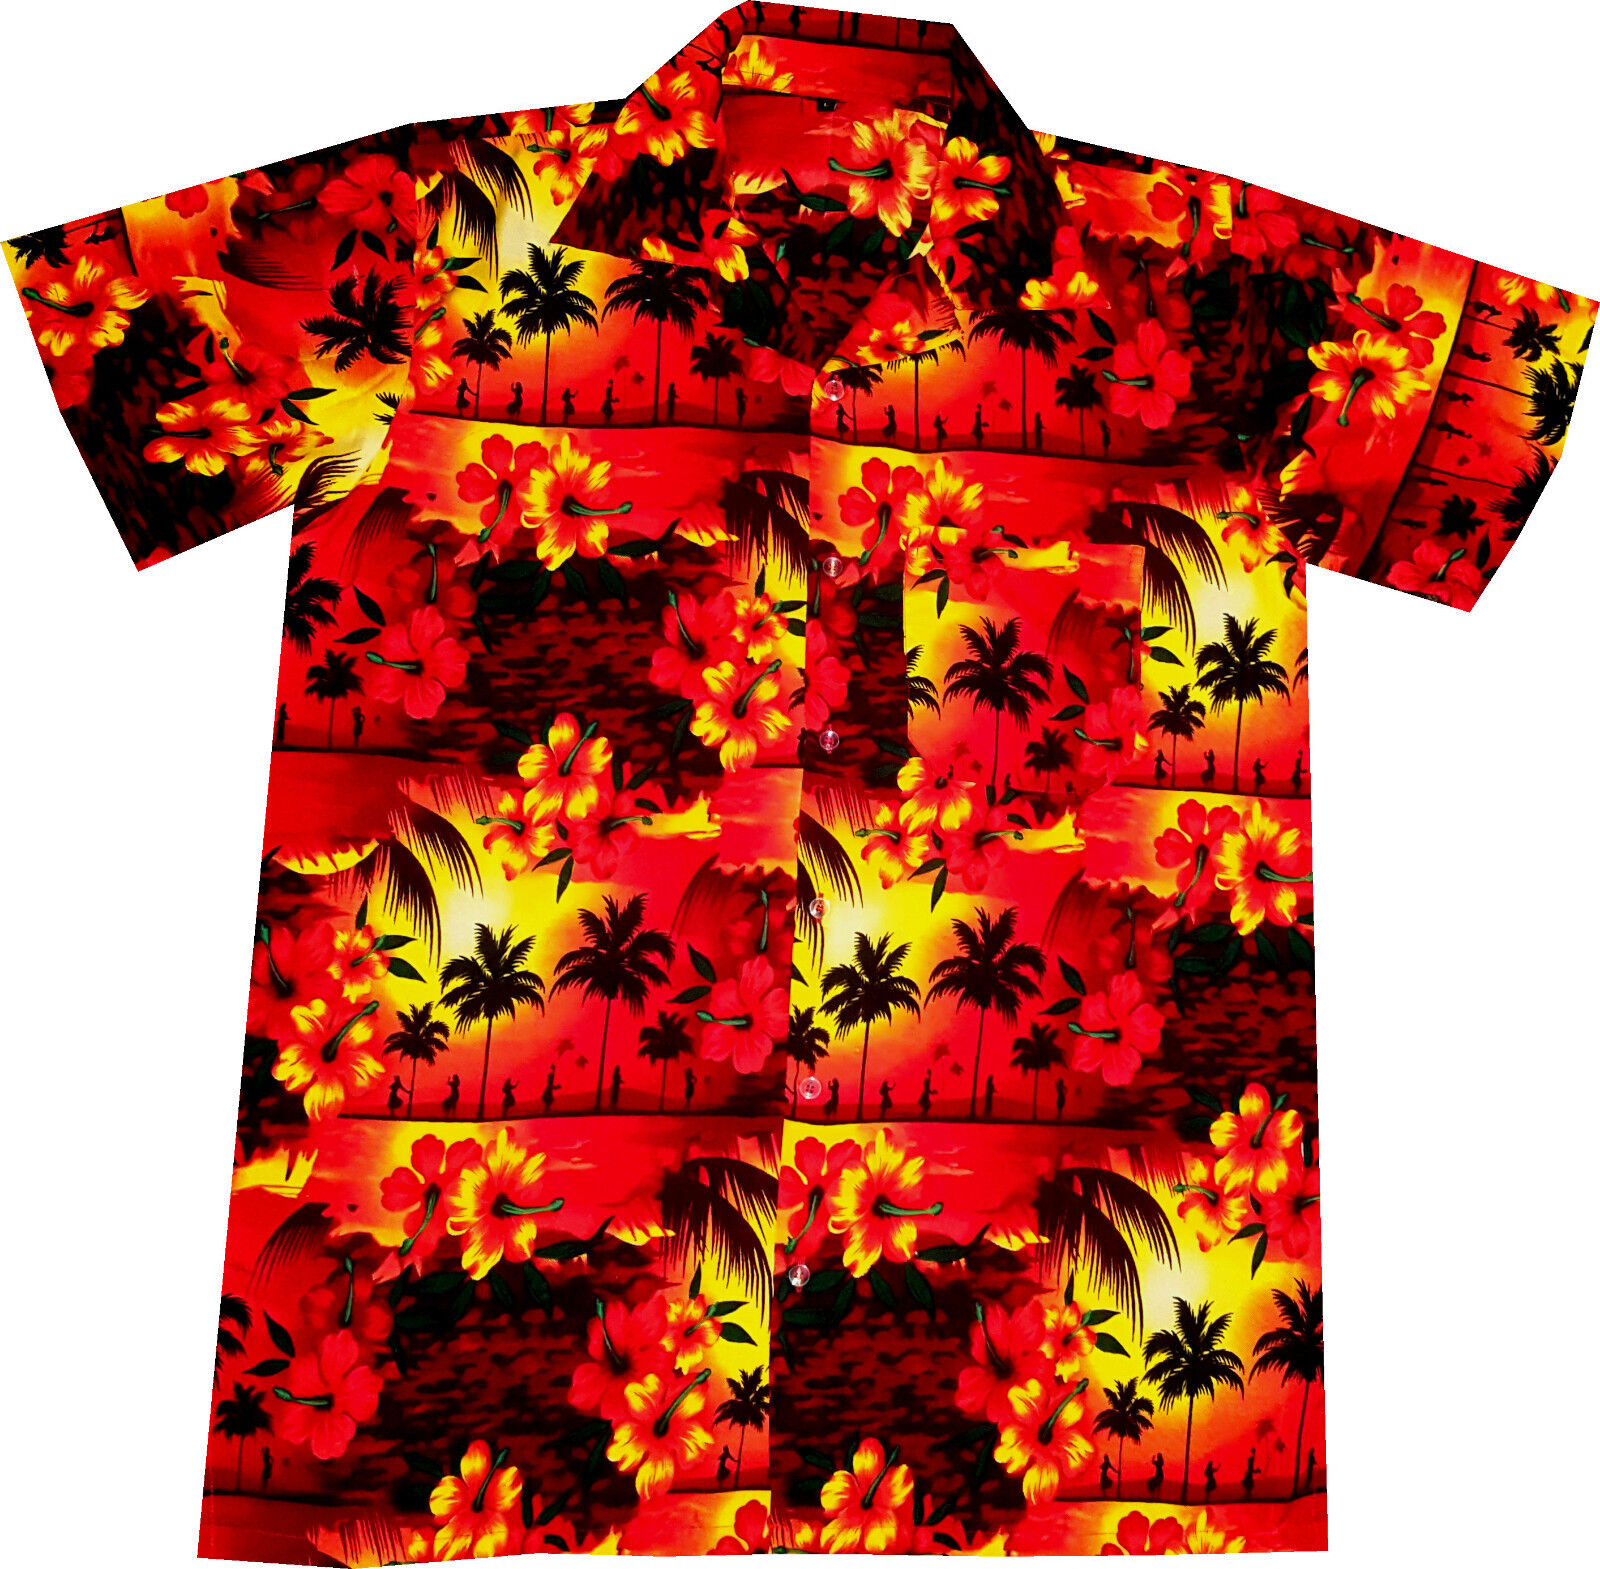 Hawaiian Shirt  Sunset Girls    size S - 6XL   Mens Hawaian Shirts   Hawaii red